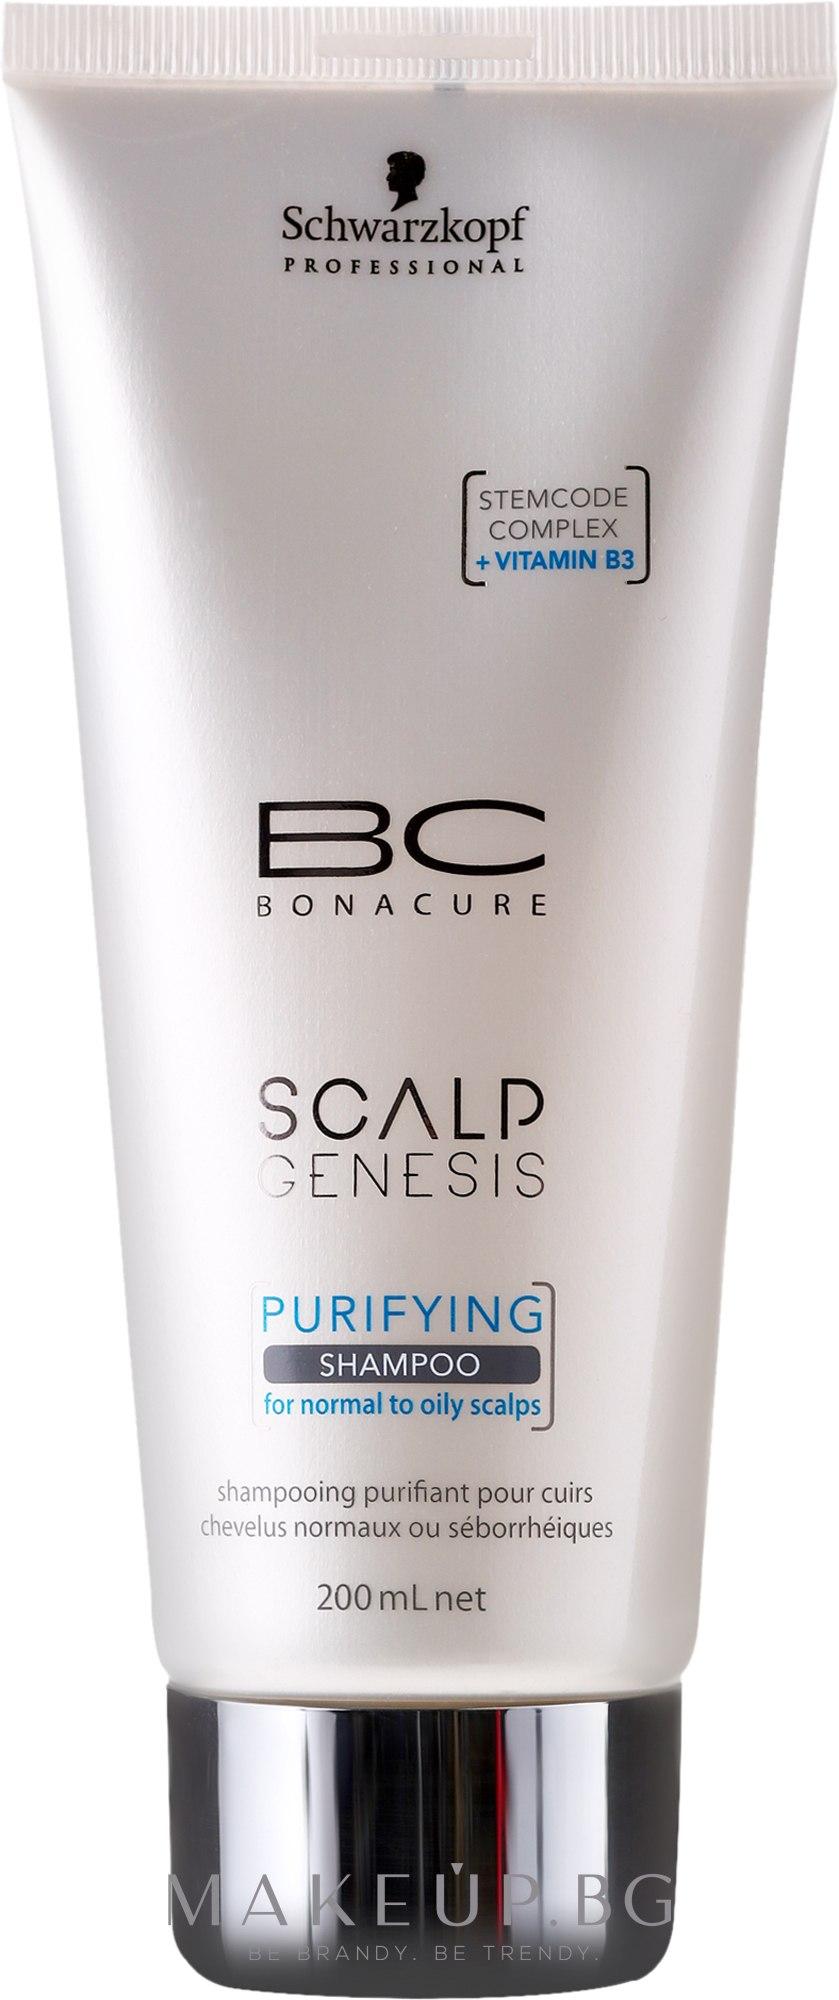 Шампоан за коса - Schwarzkopf Professional BC Bonacure Scalp Genesis Purifying Shampoo — снимка 200 ml